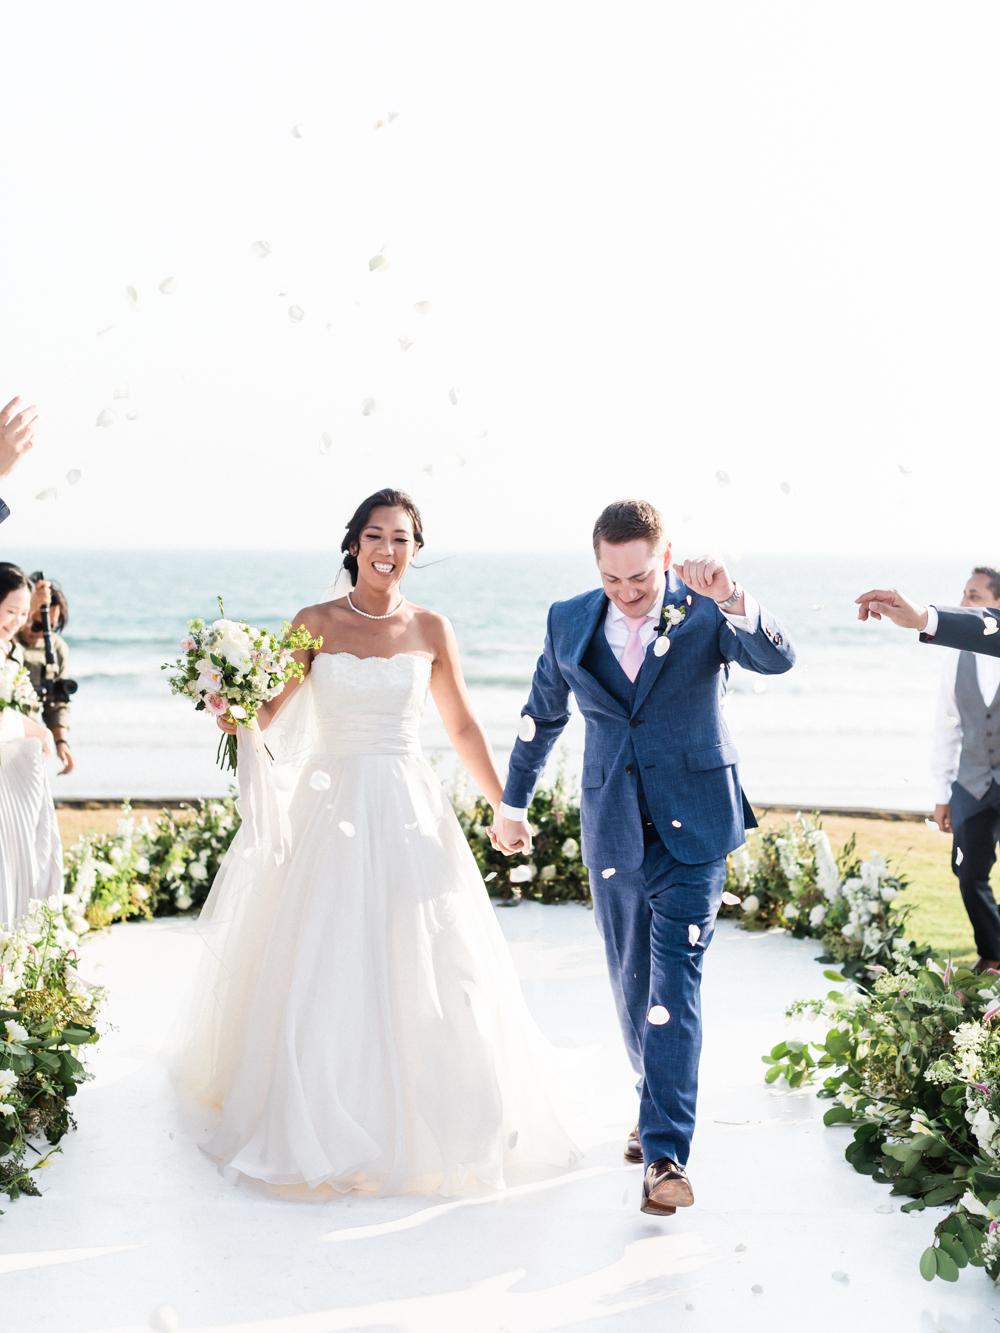 Bali_Real_Wedding_(c)_Rory_Wylie-69.jpg